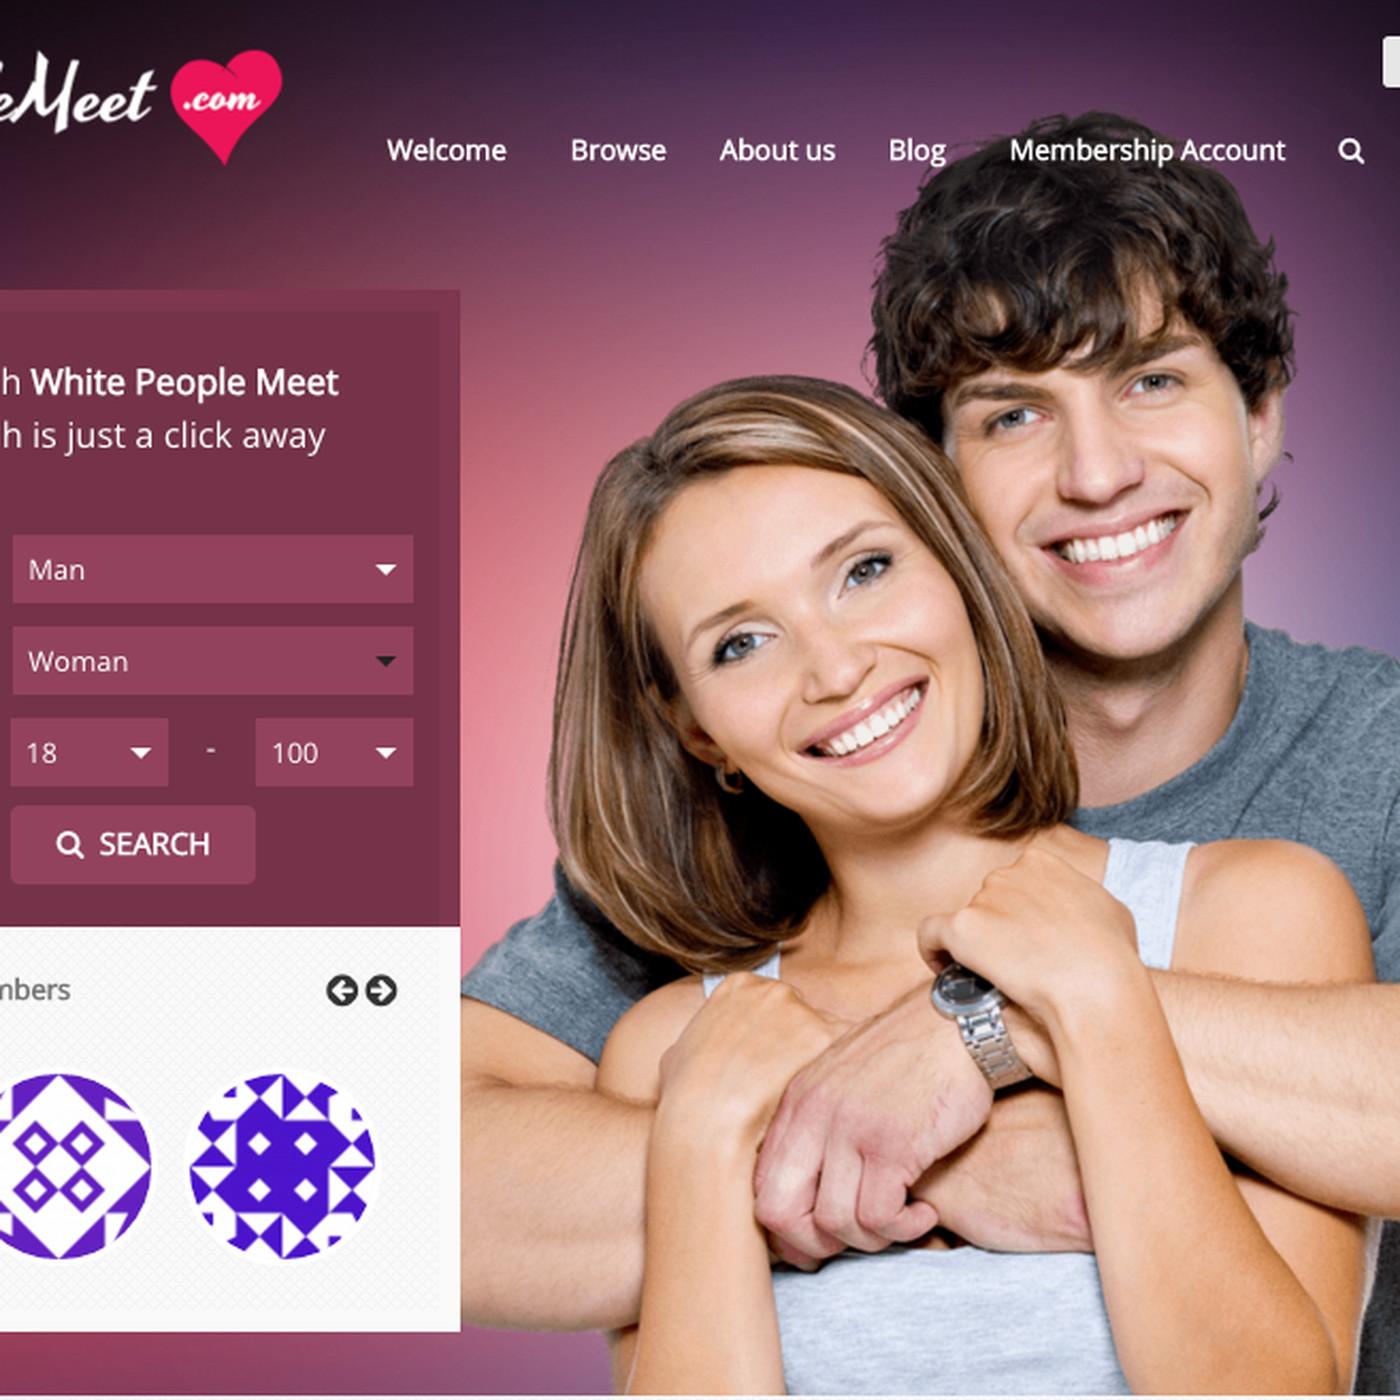 speed dating bonn 2014 internet dating oxfordshire